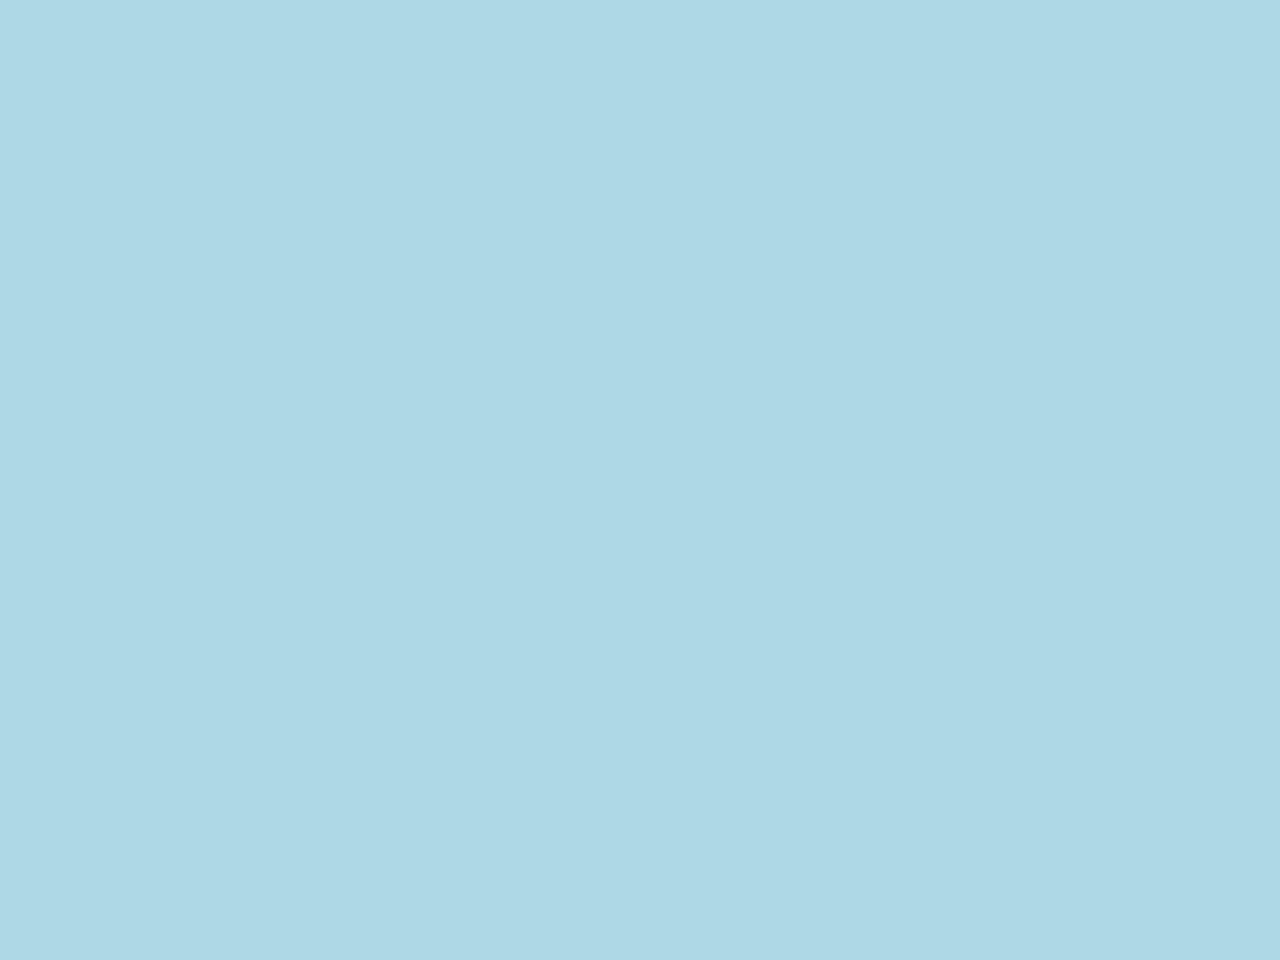 1280x960 Light Blue Solid Color Background